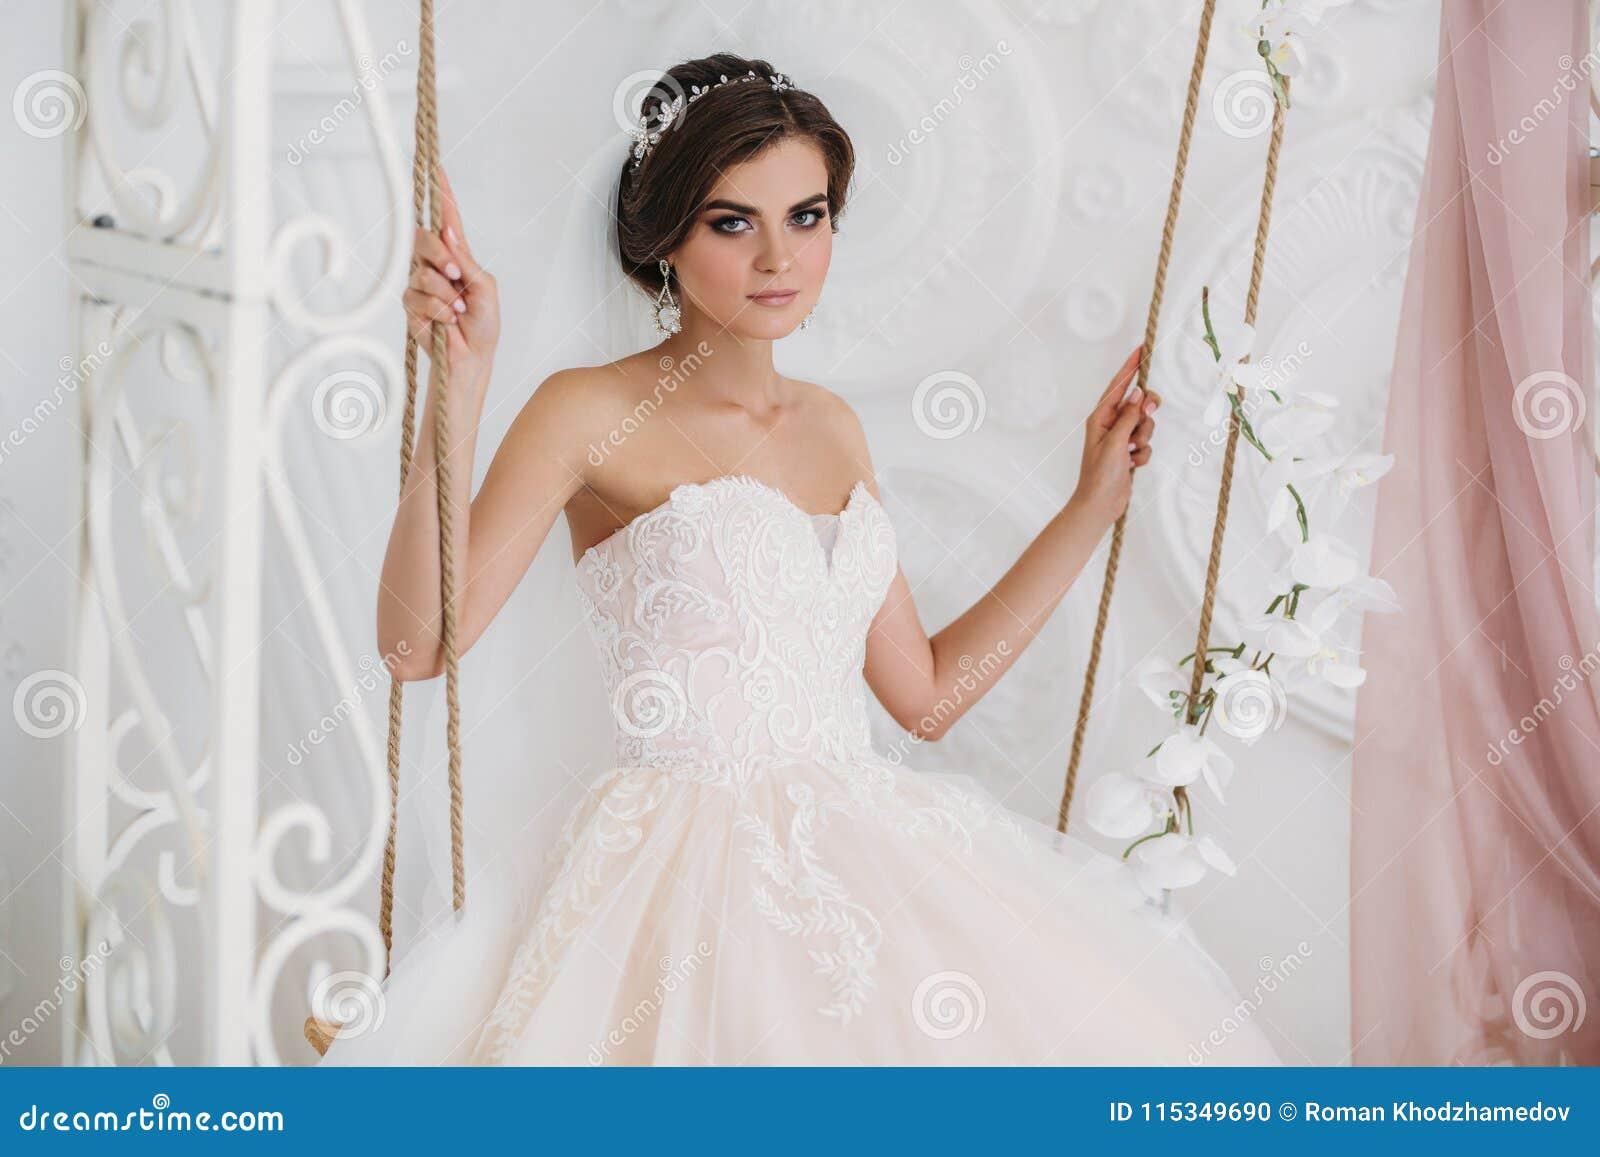 Peinados de novia con vestido strapless